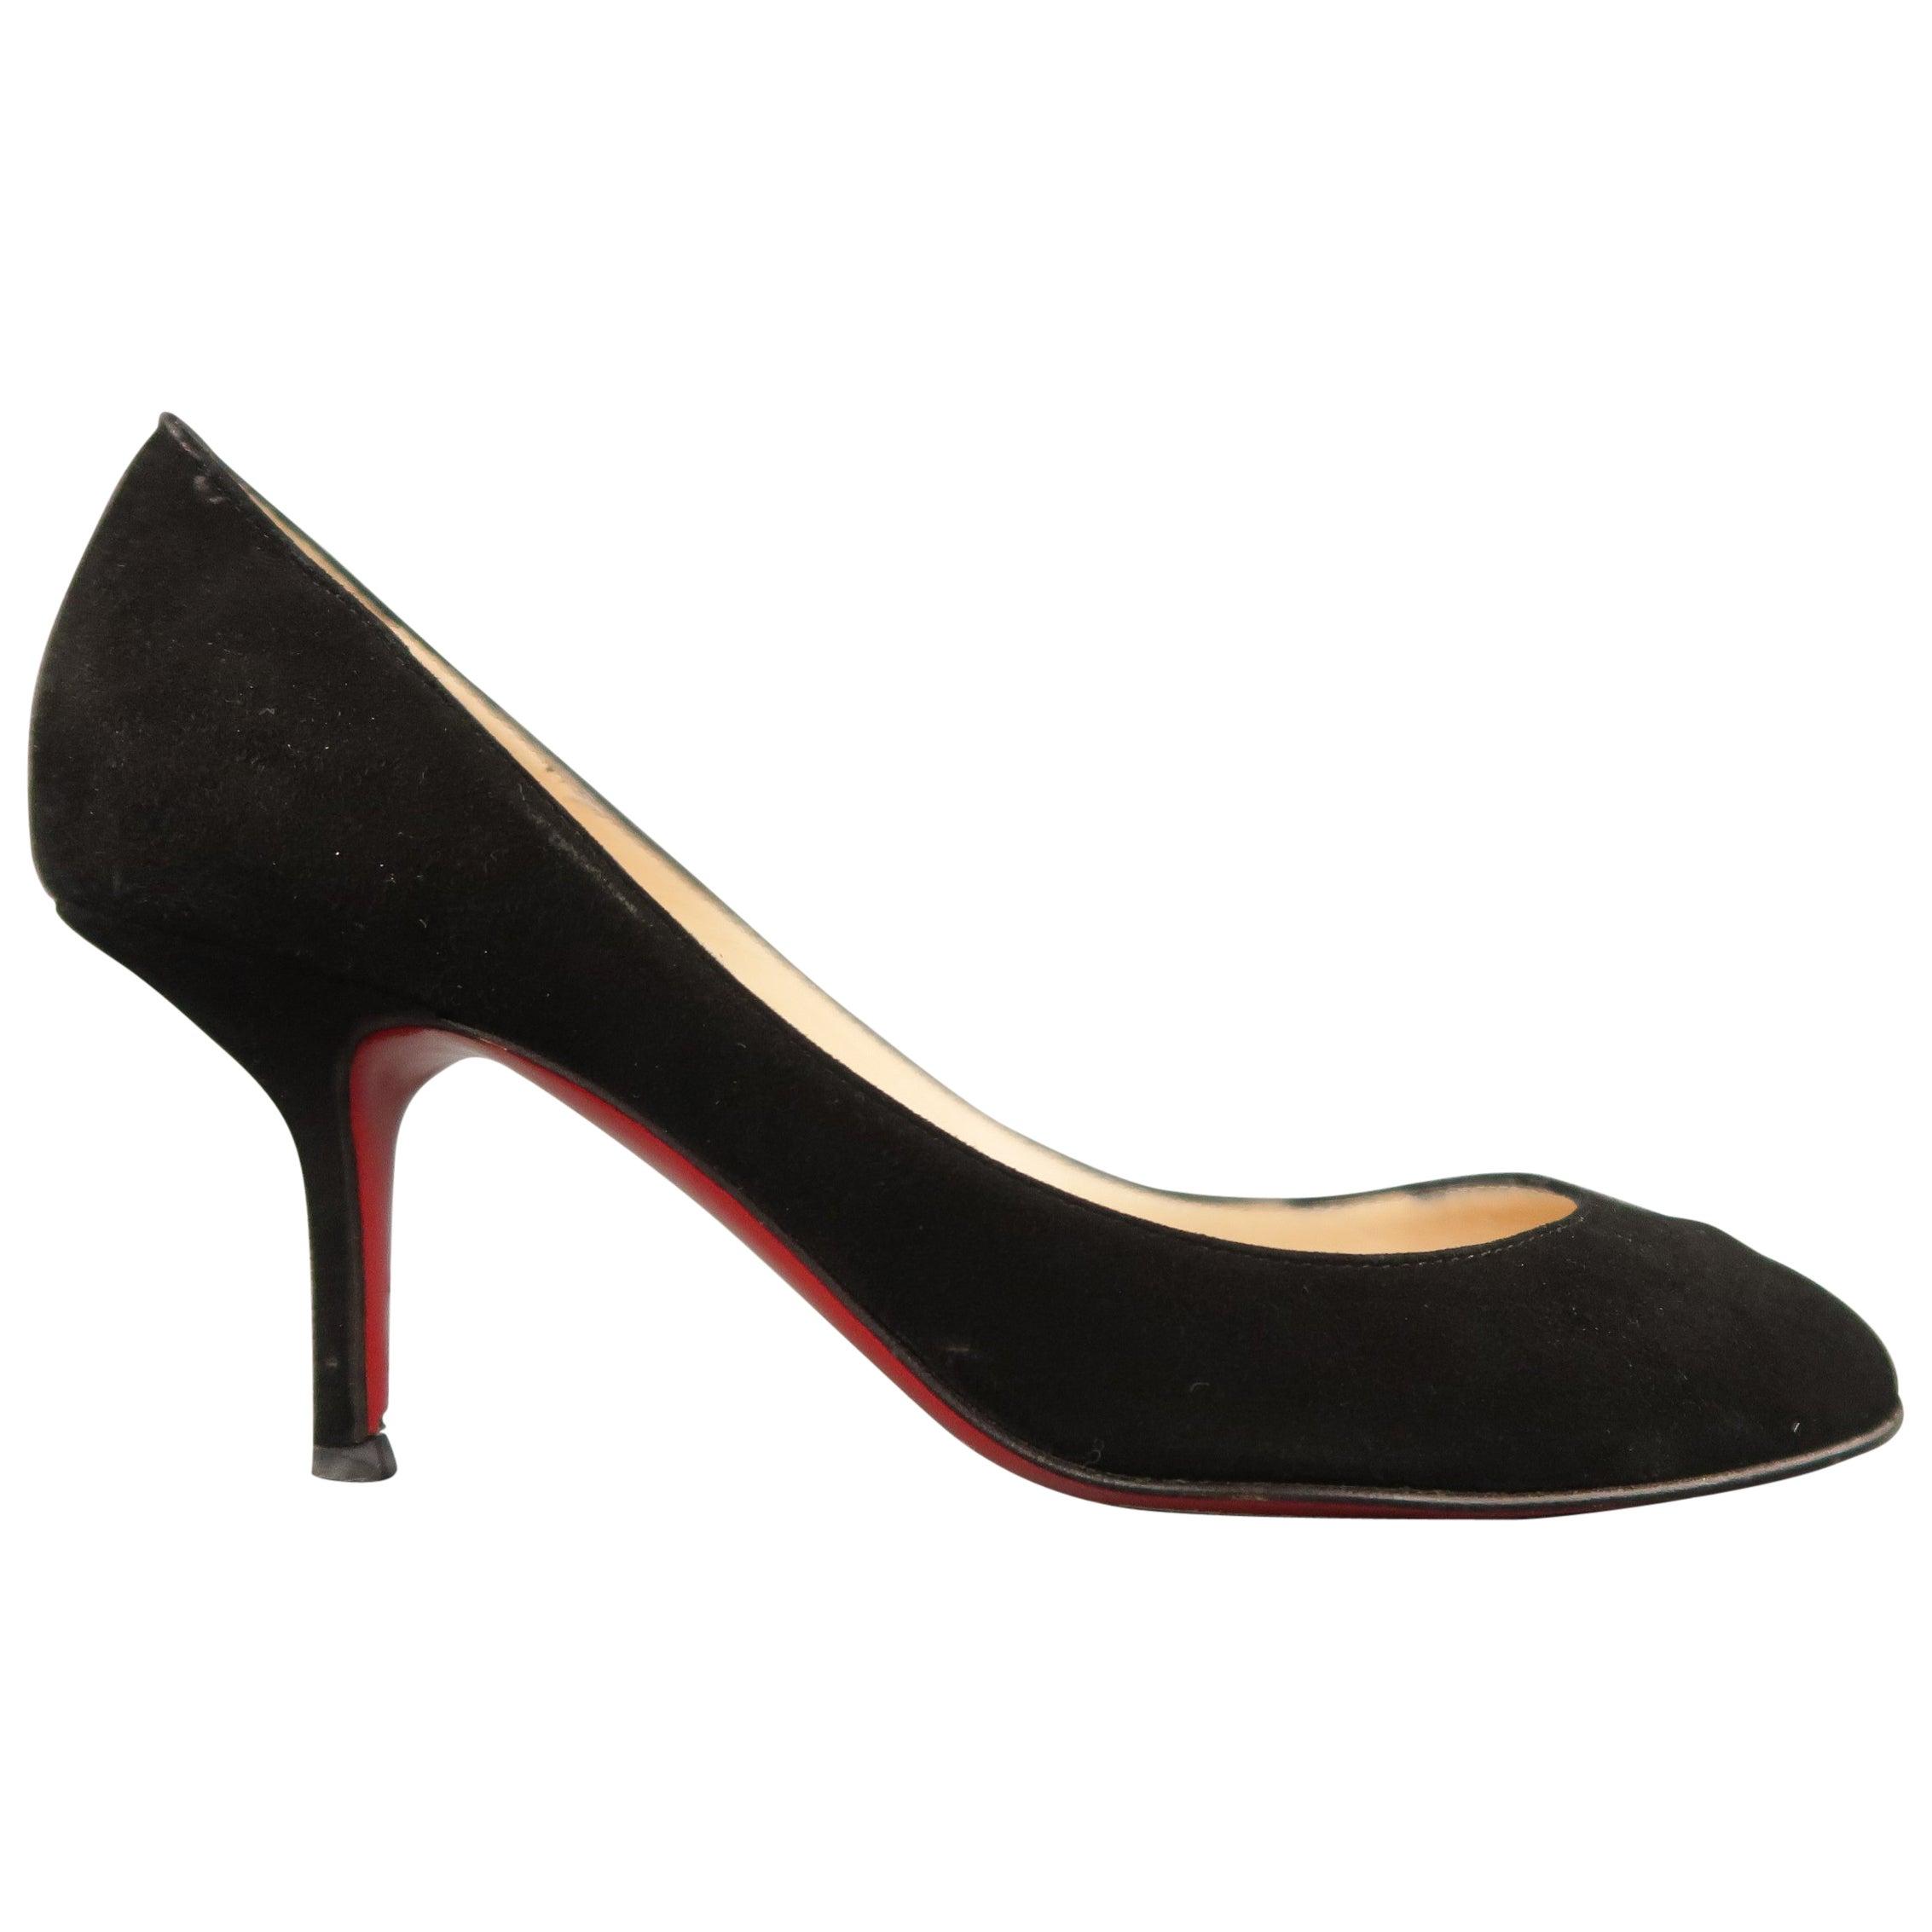 059da222839 CHRISTIAN LOUBOUTIN Size 6.5 Black Suede Peep Toe Kitten Heel Pumps